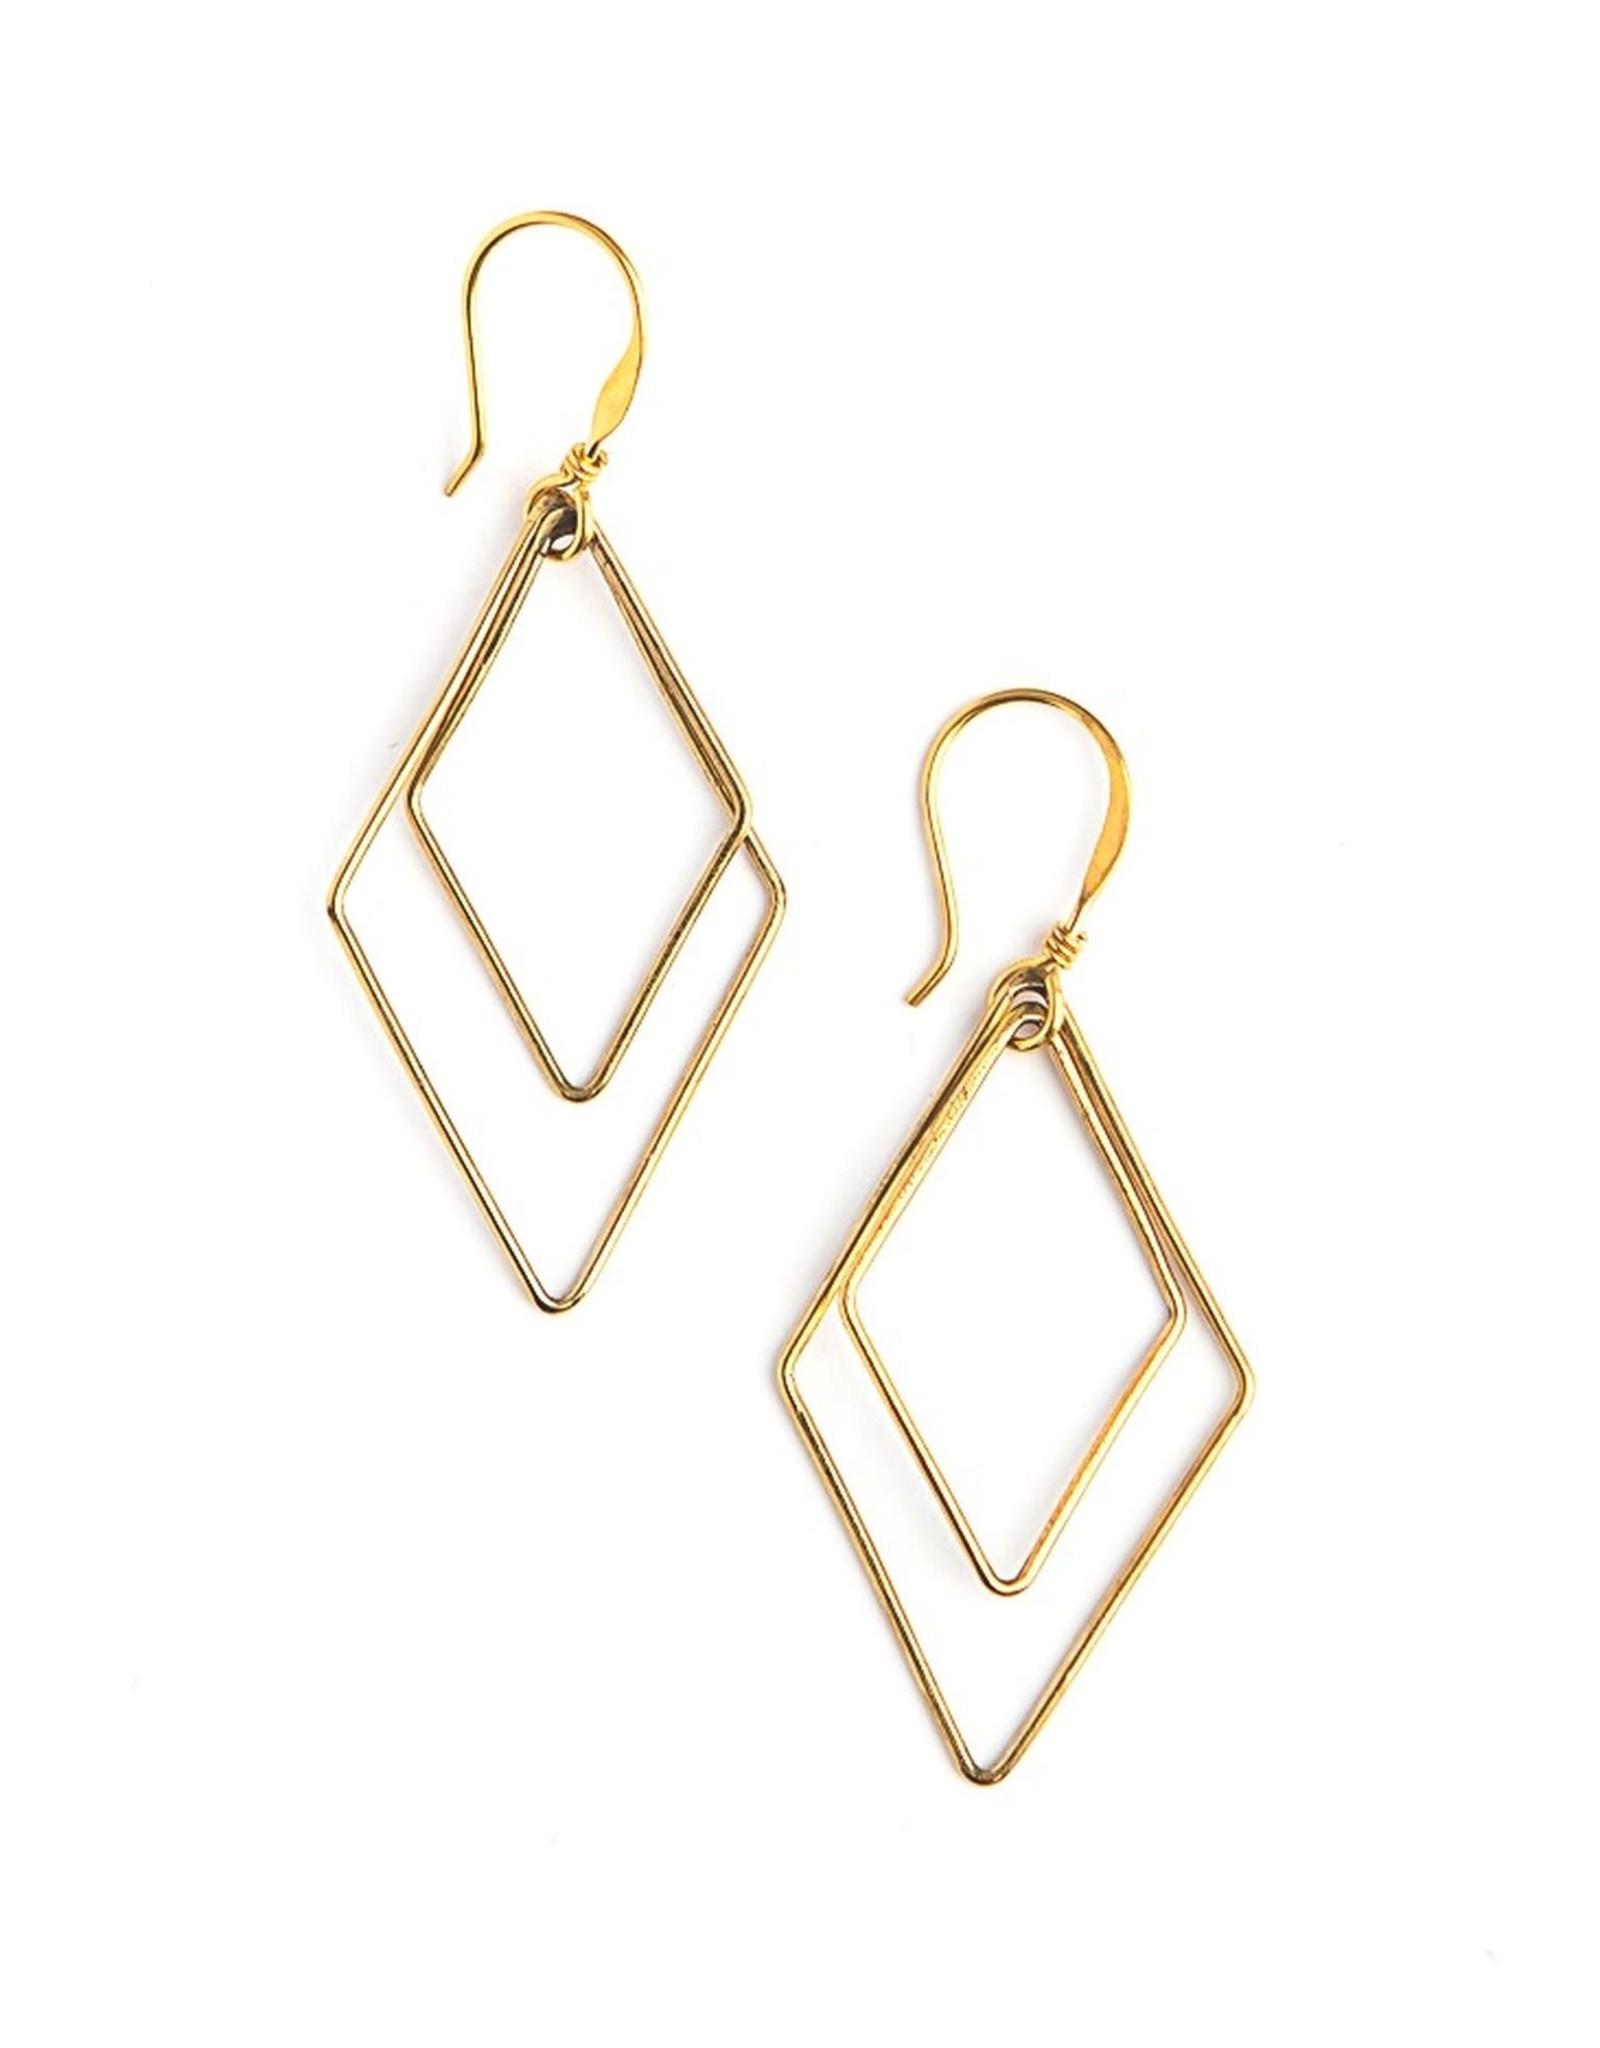 Rhombus Gold Earrings